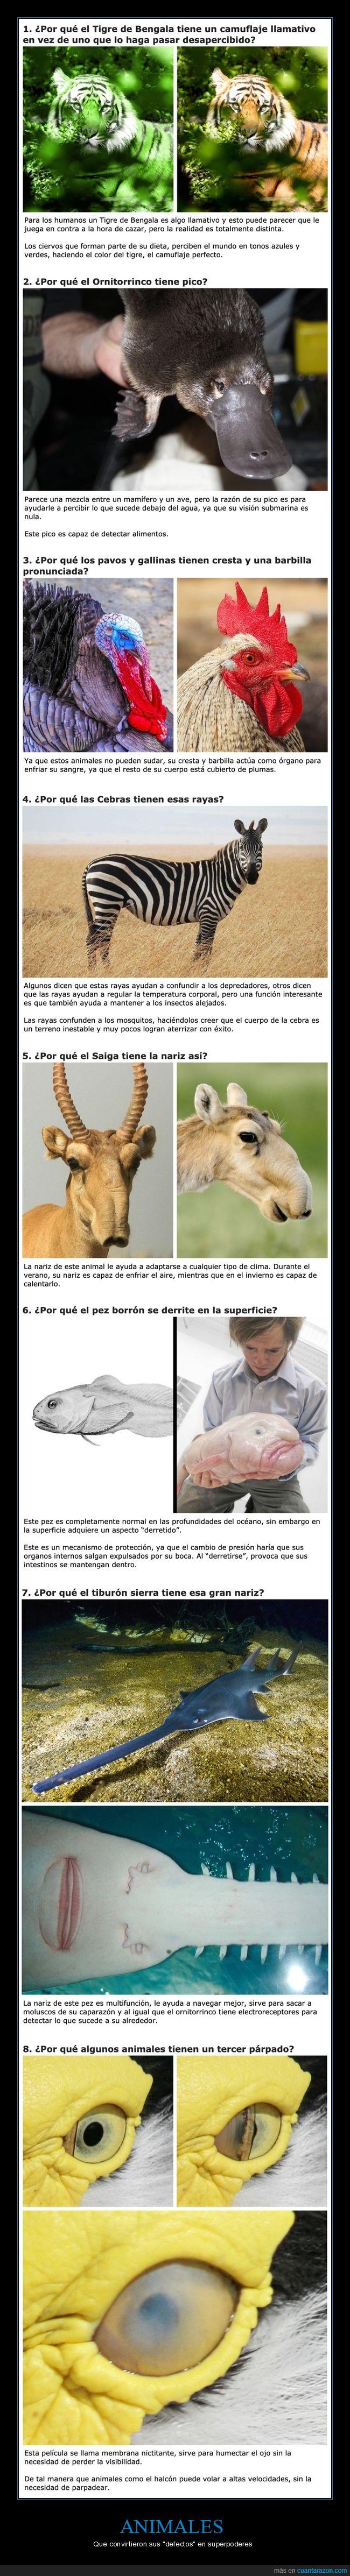 animales,curiosidades